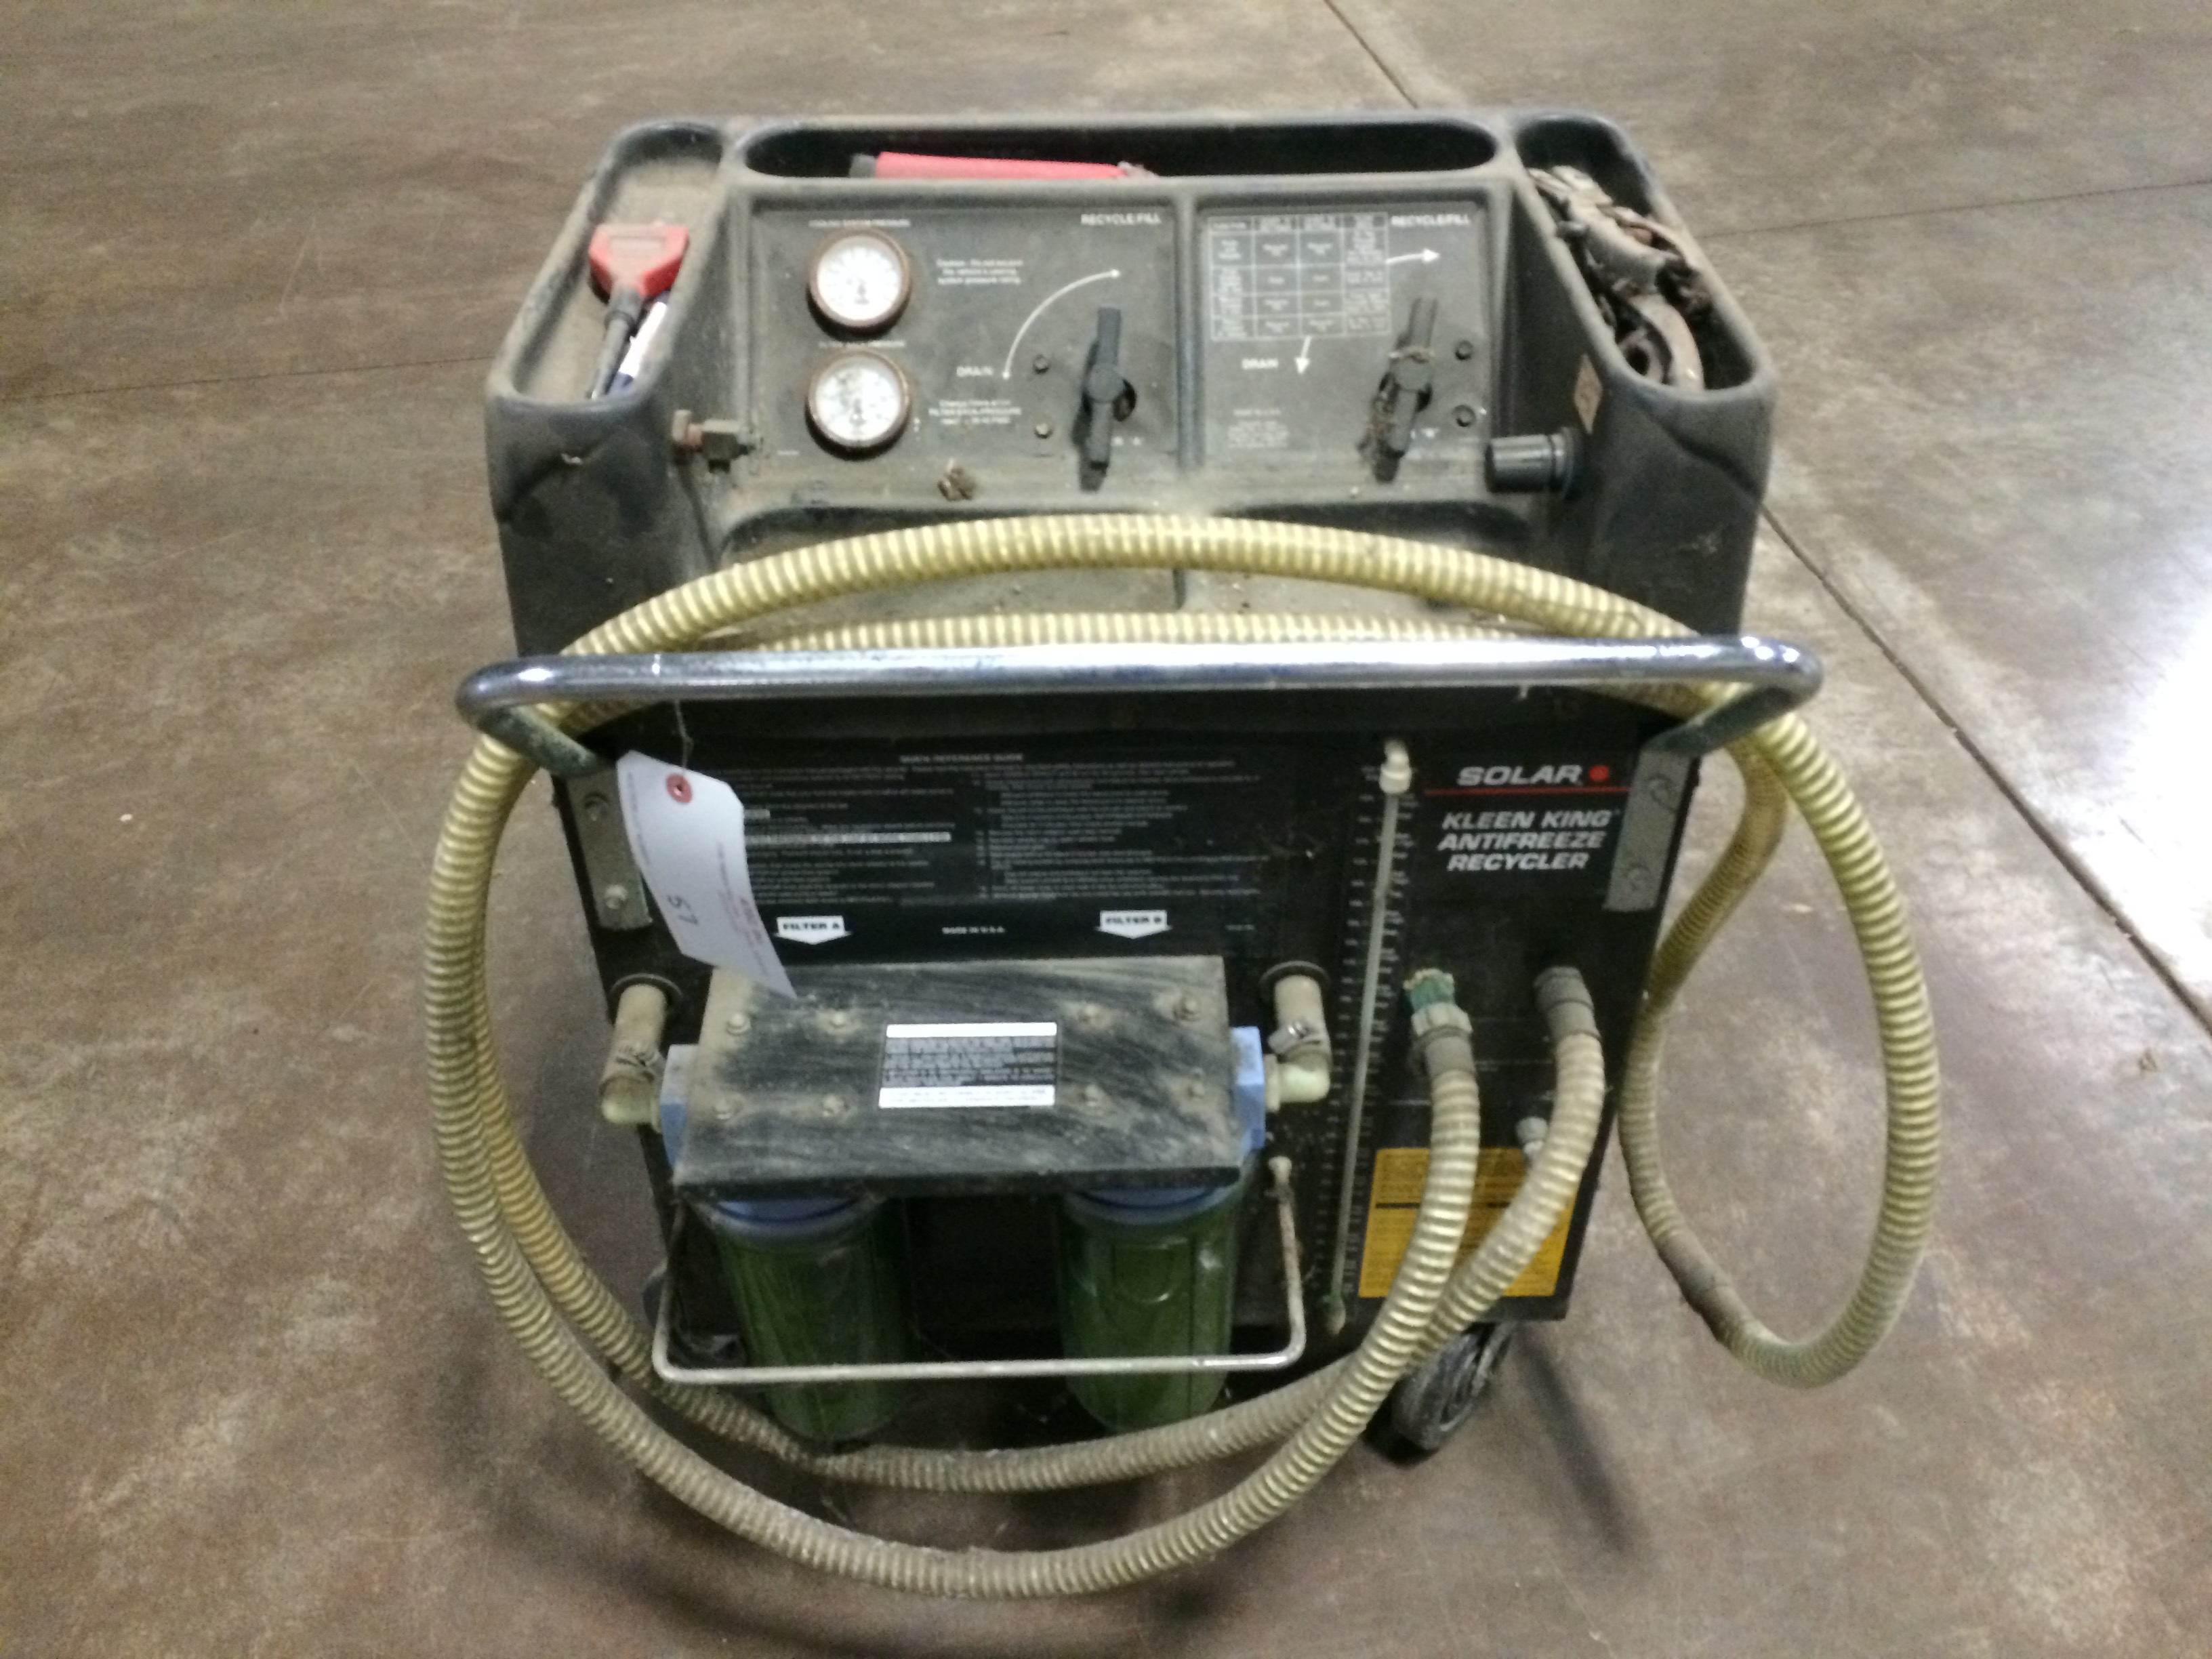 solar kleen king antifreeze recycler manual